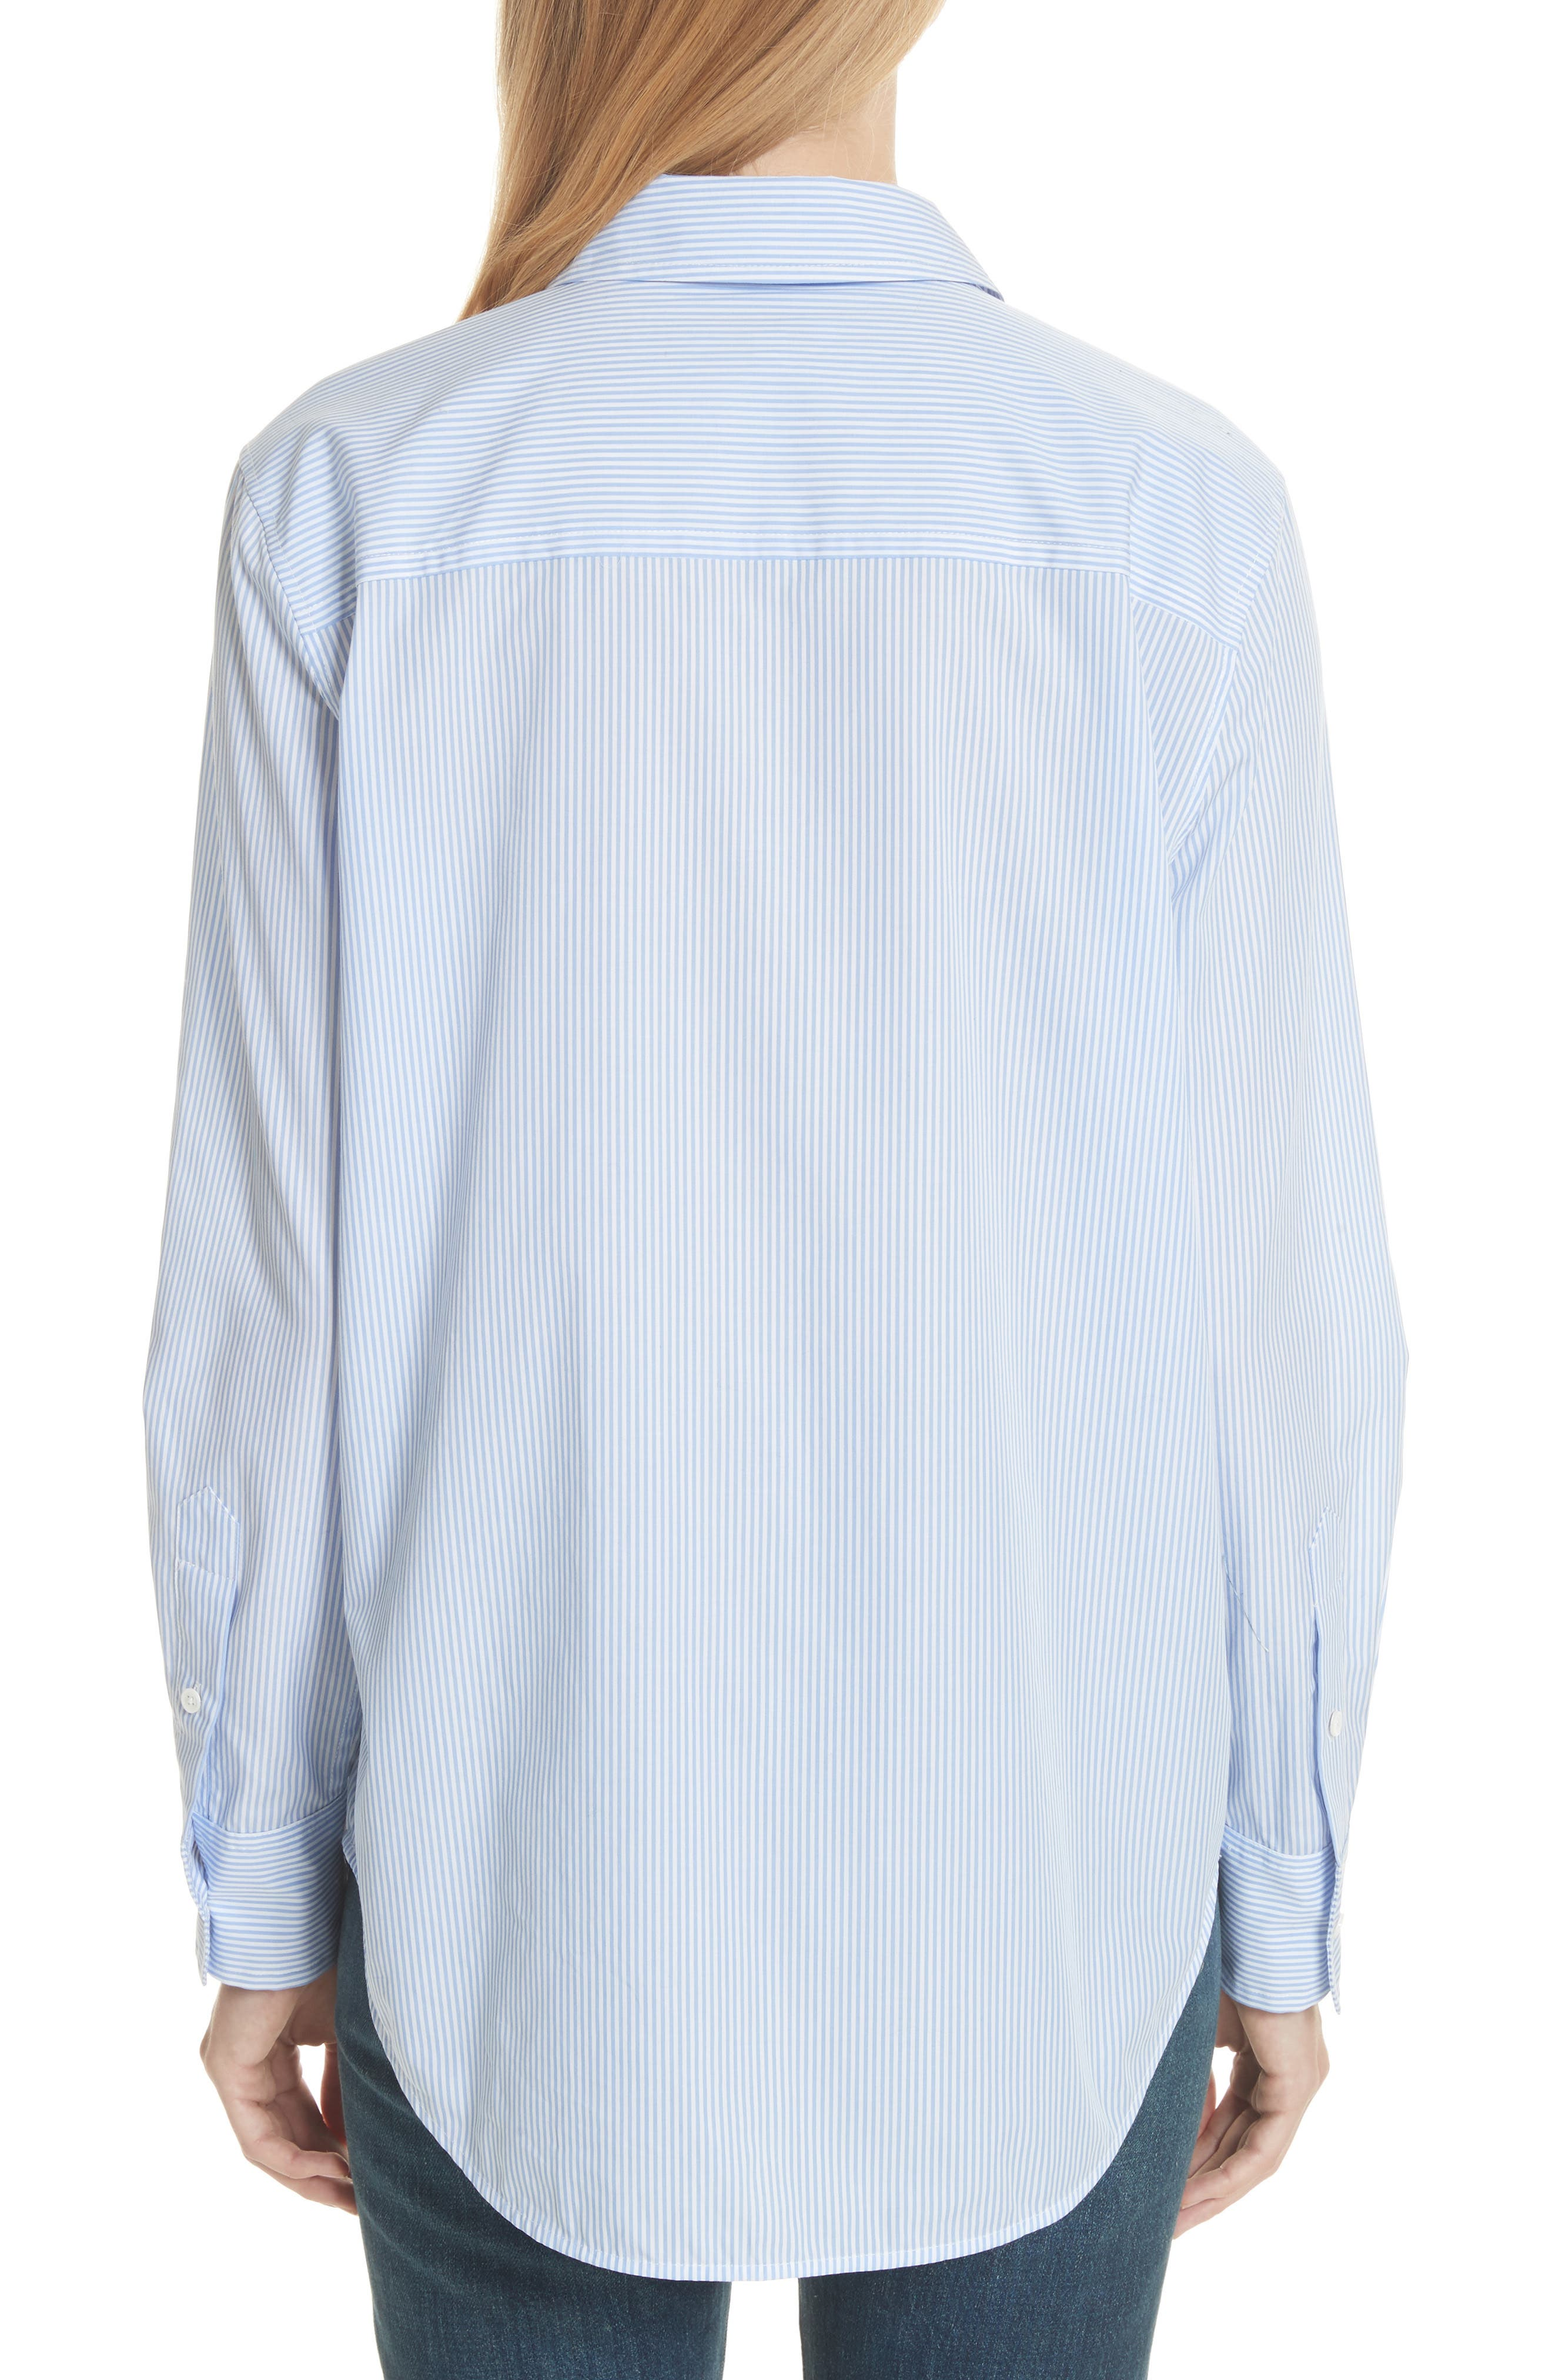 Kenton Stripe Poplin Top,                             Alternate thumbnail 2, color,                             Bright White